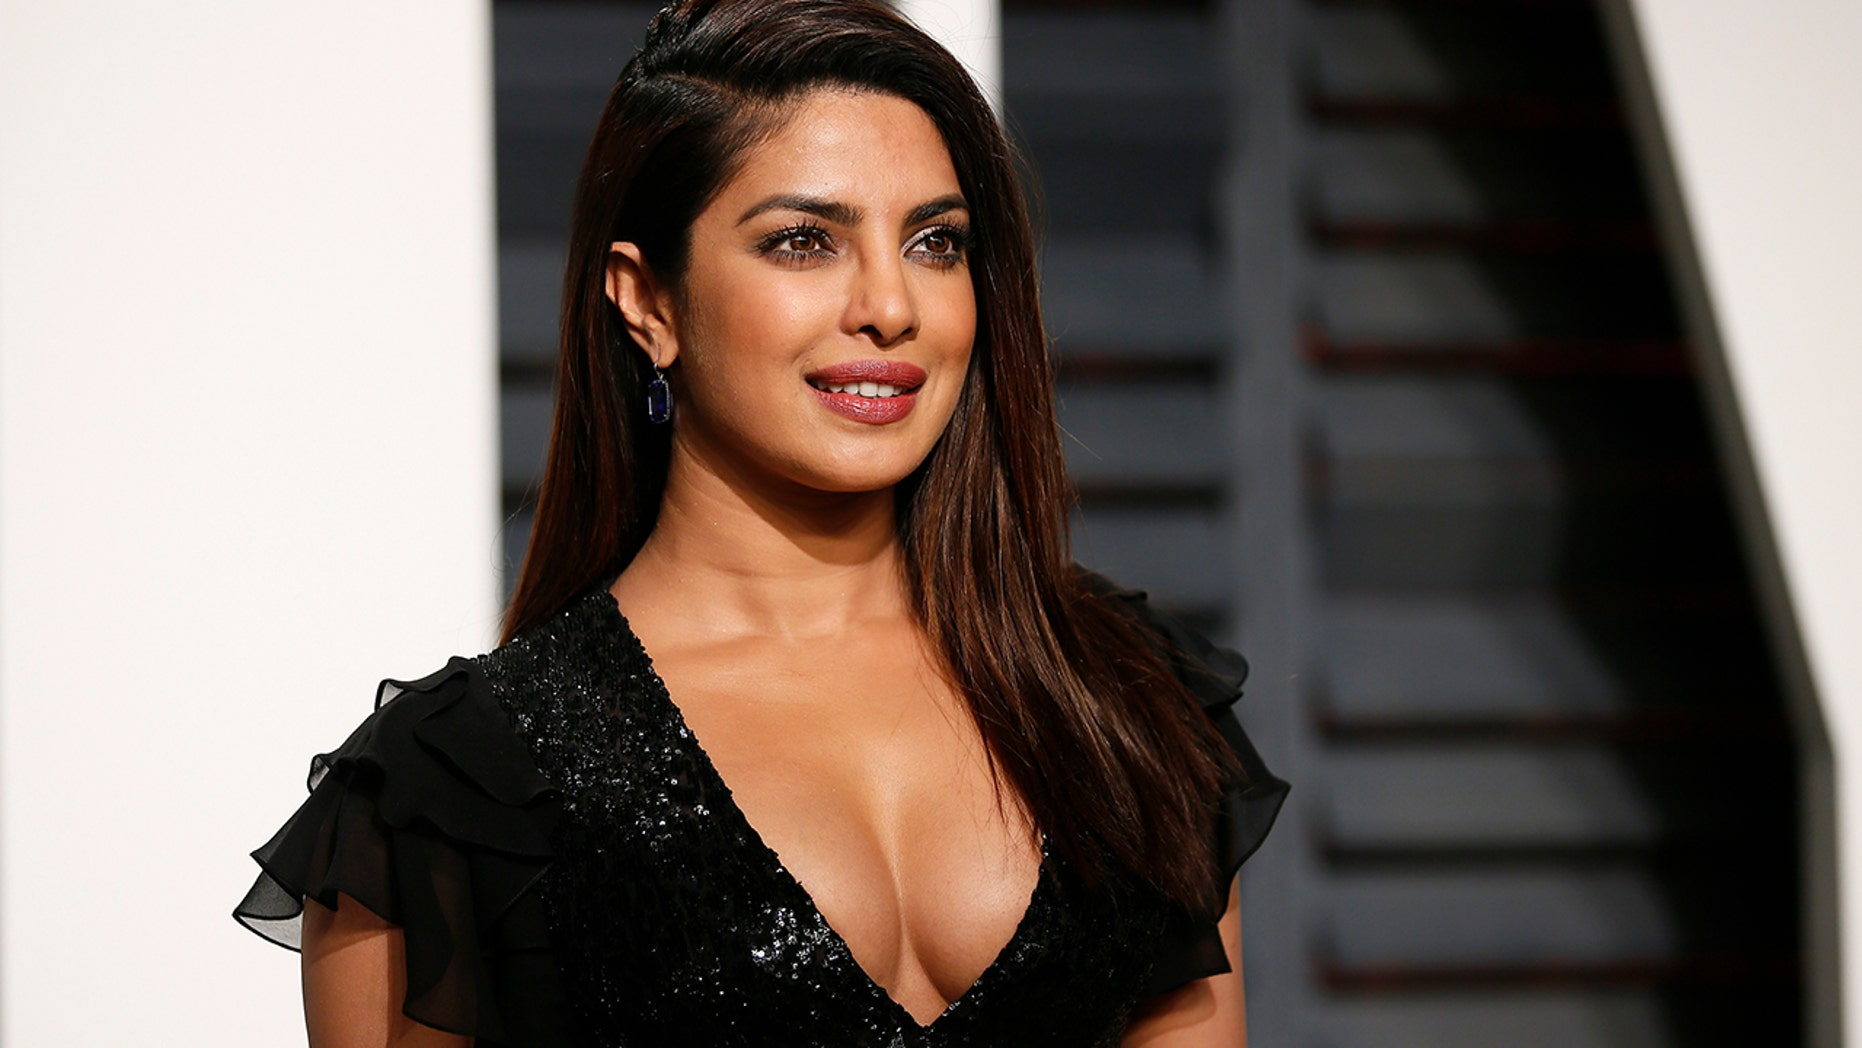 Priyanka Chopra admits she regrets once endorsing a skin-lightening cream